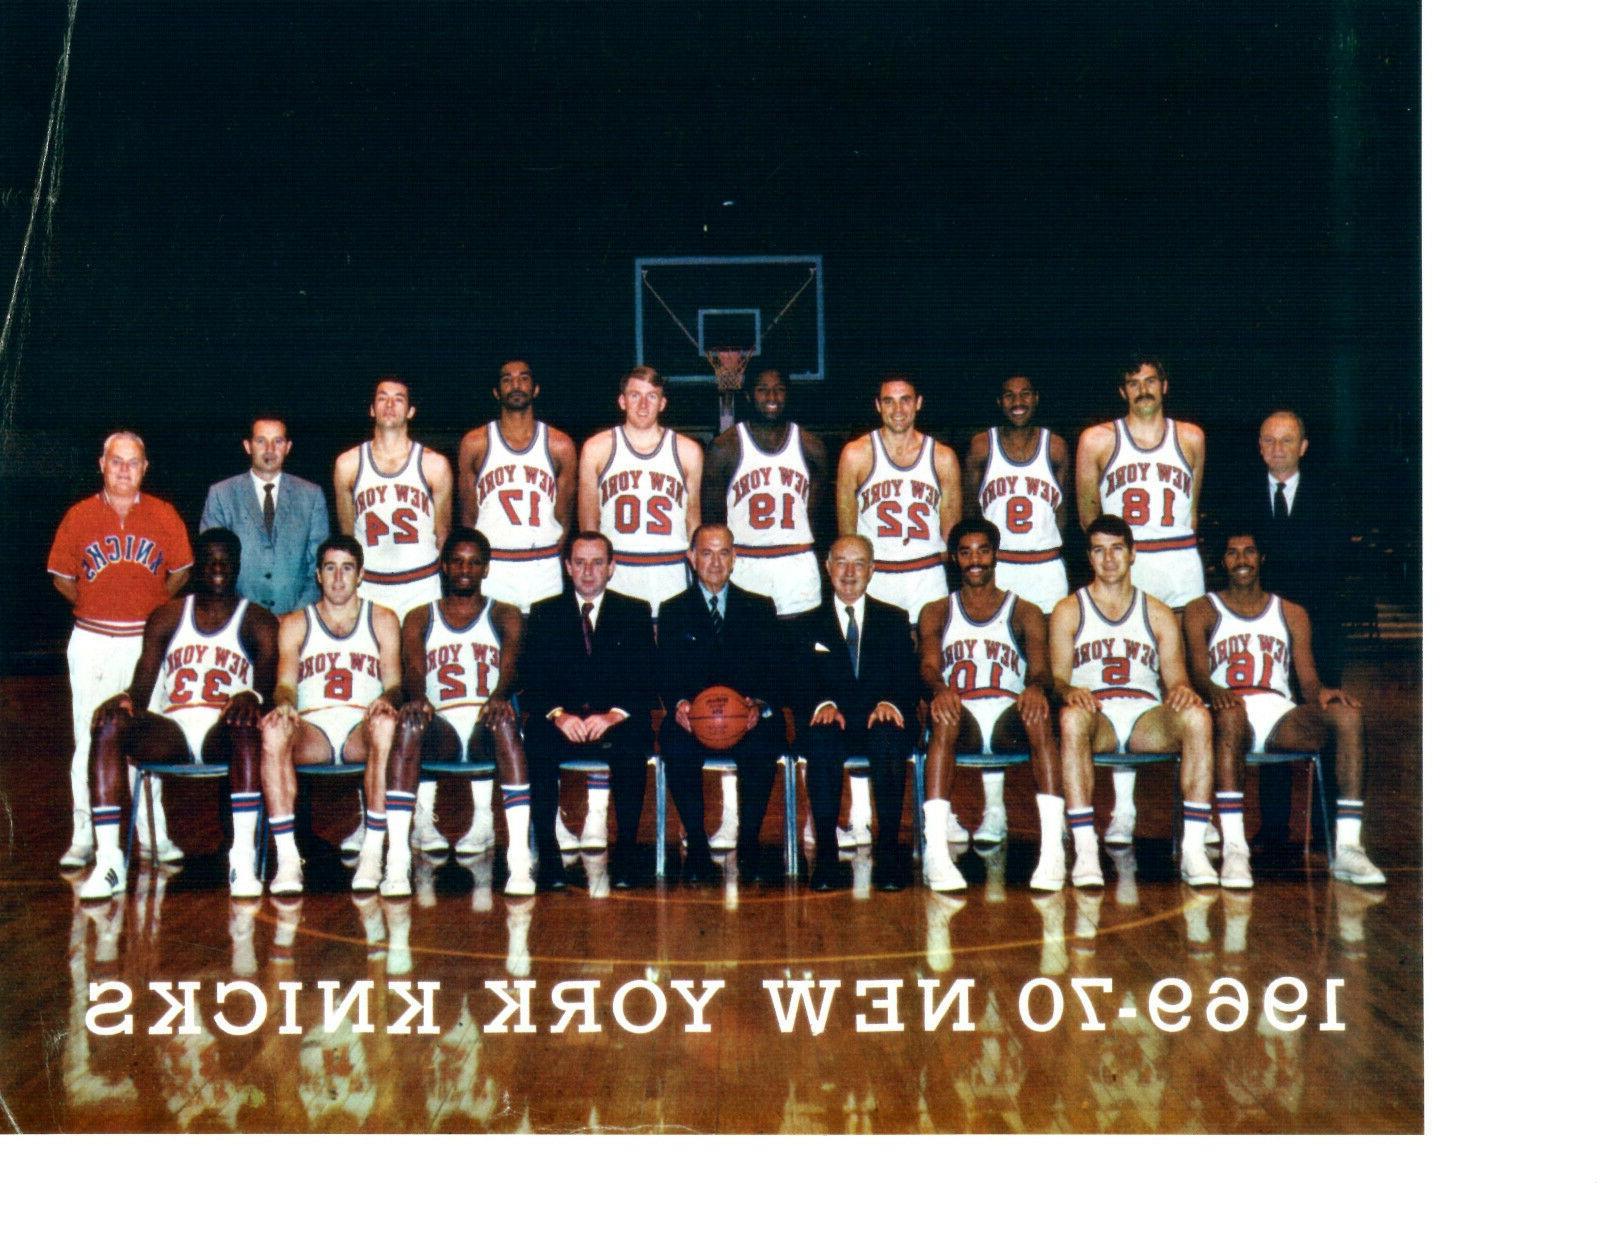 1969 new york knicks 8x10 team photo